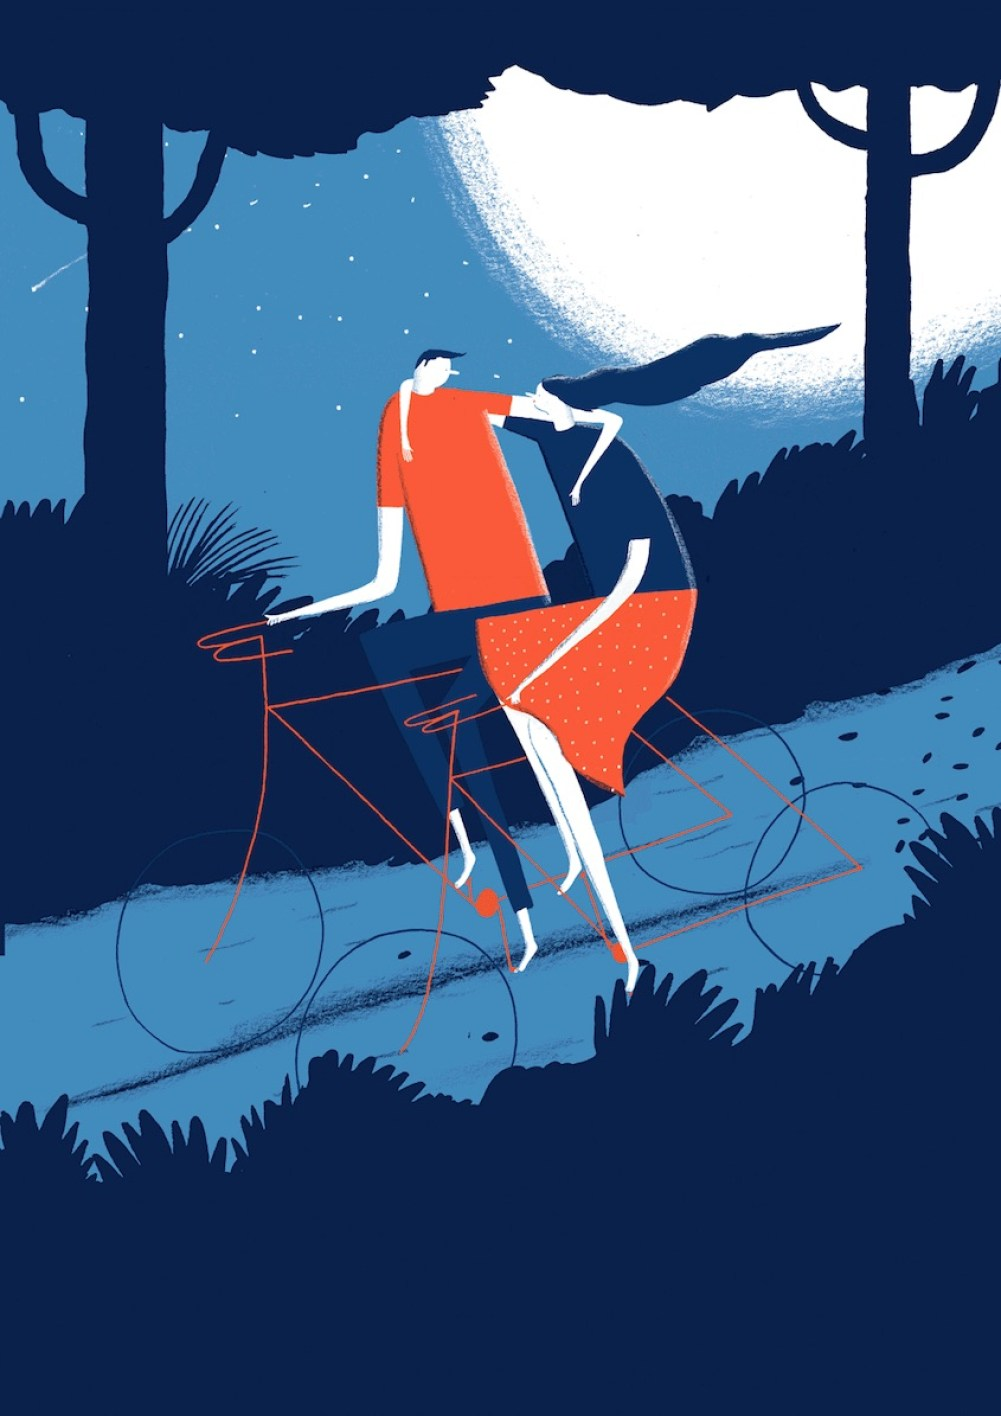 daniel-frost-illustrations_urbancycling_9